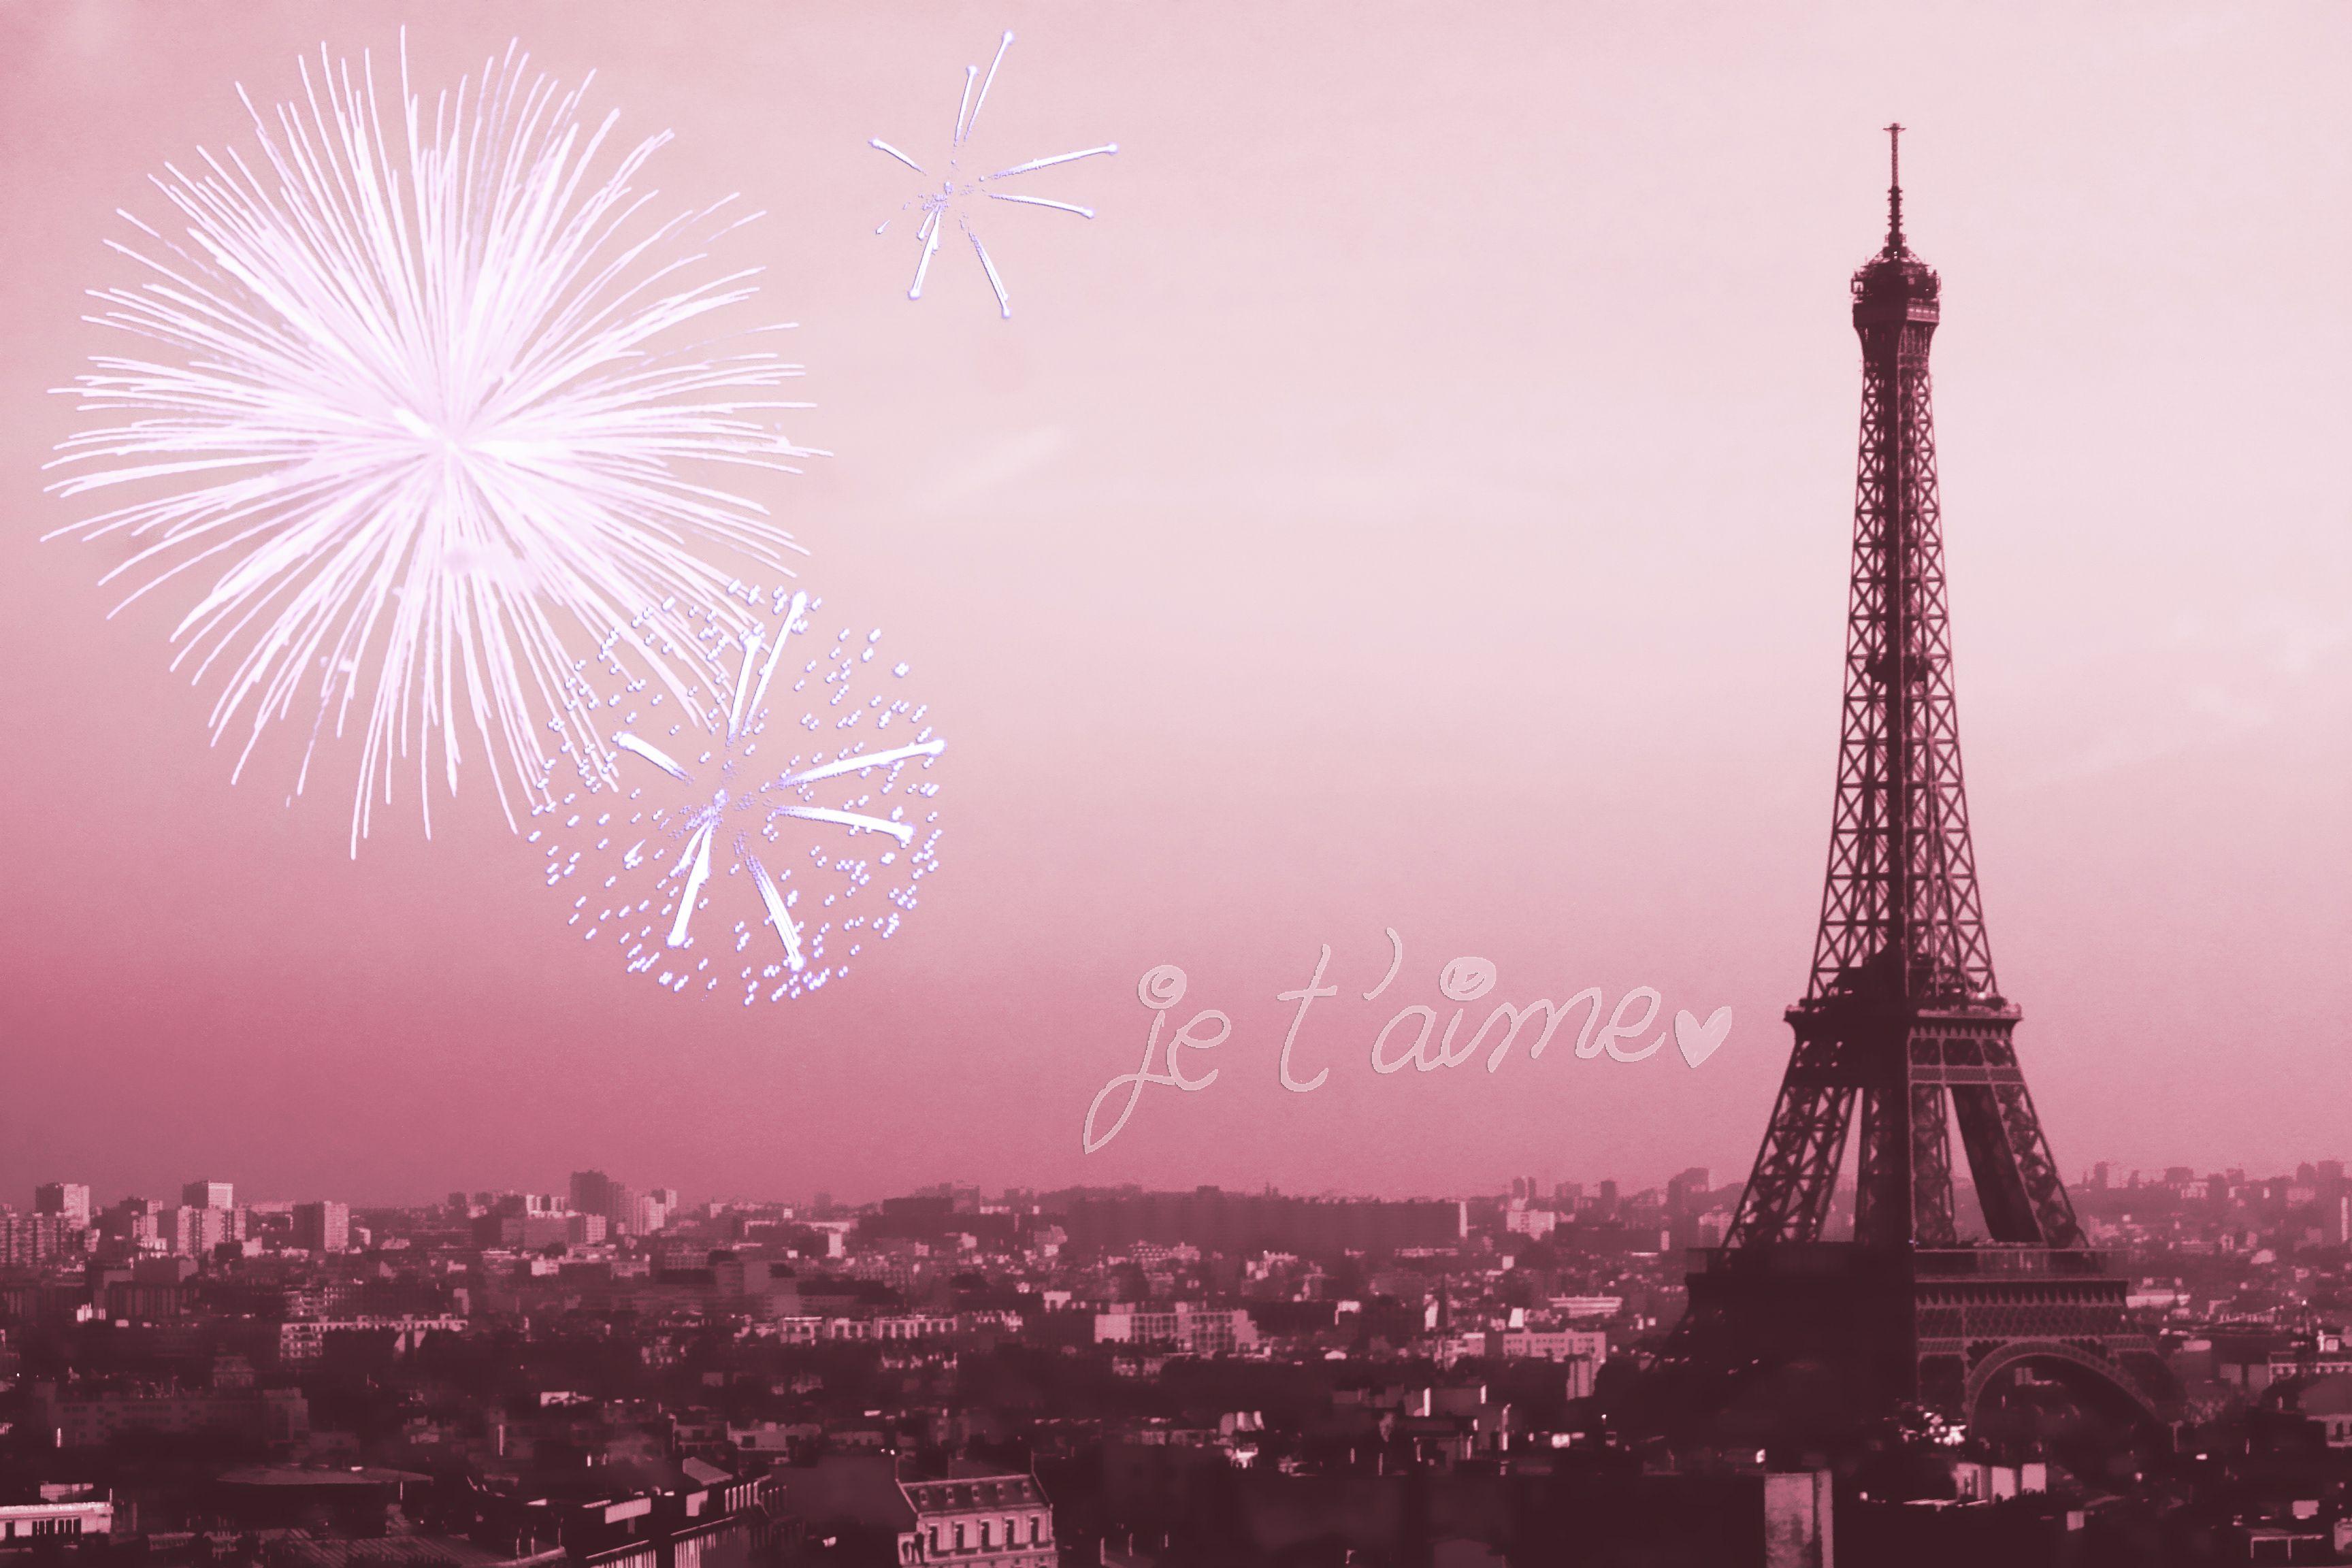 Paris Wallpapers 1080p For Desktop Wallpaper 3456 X 2304 Px